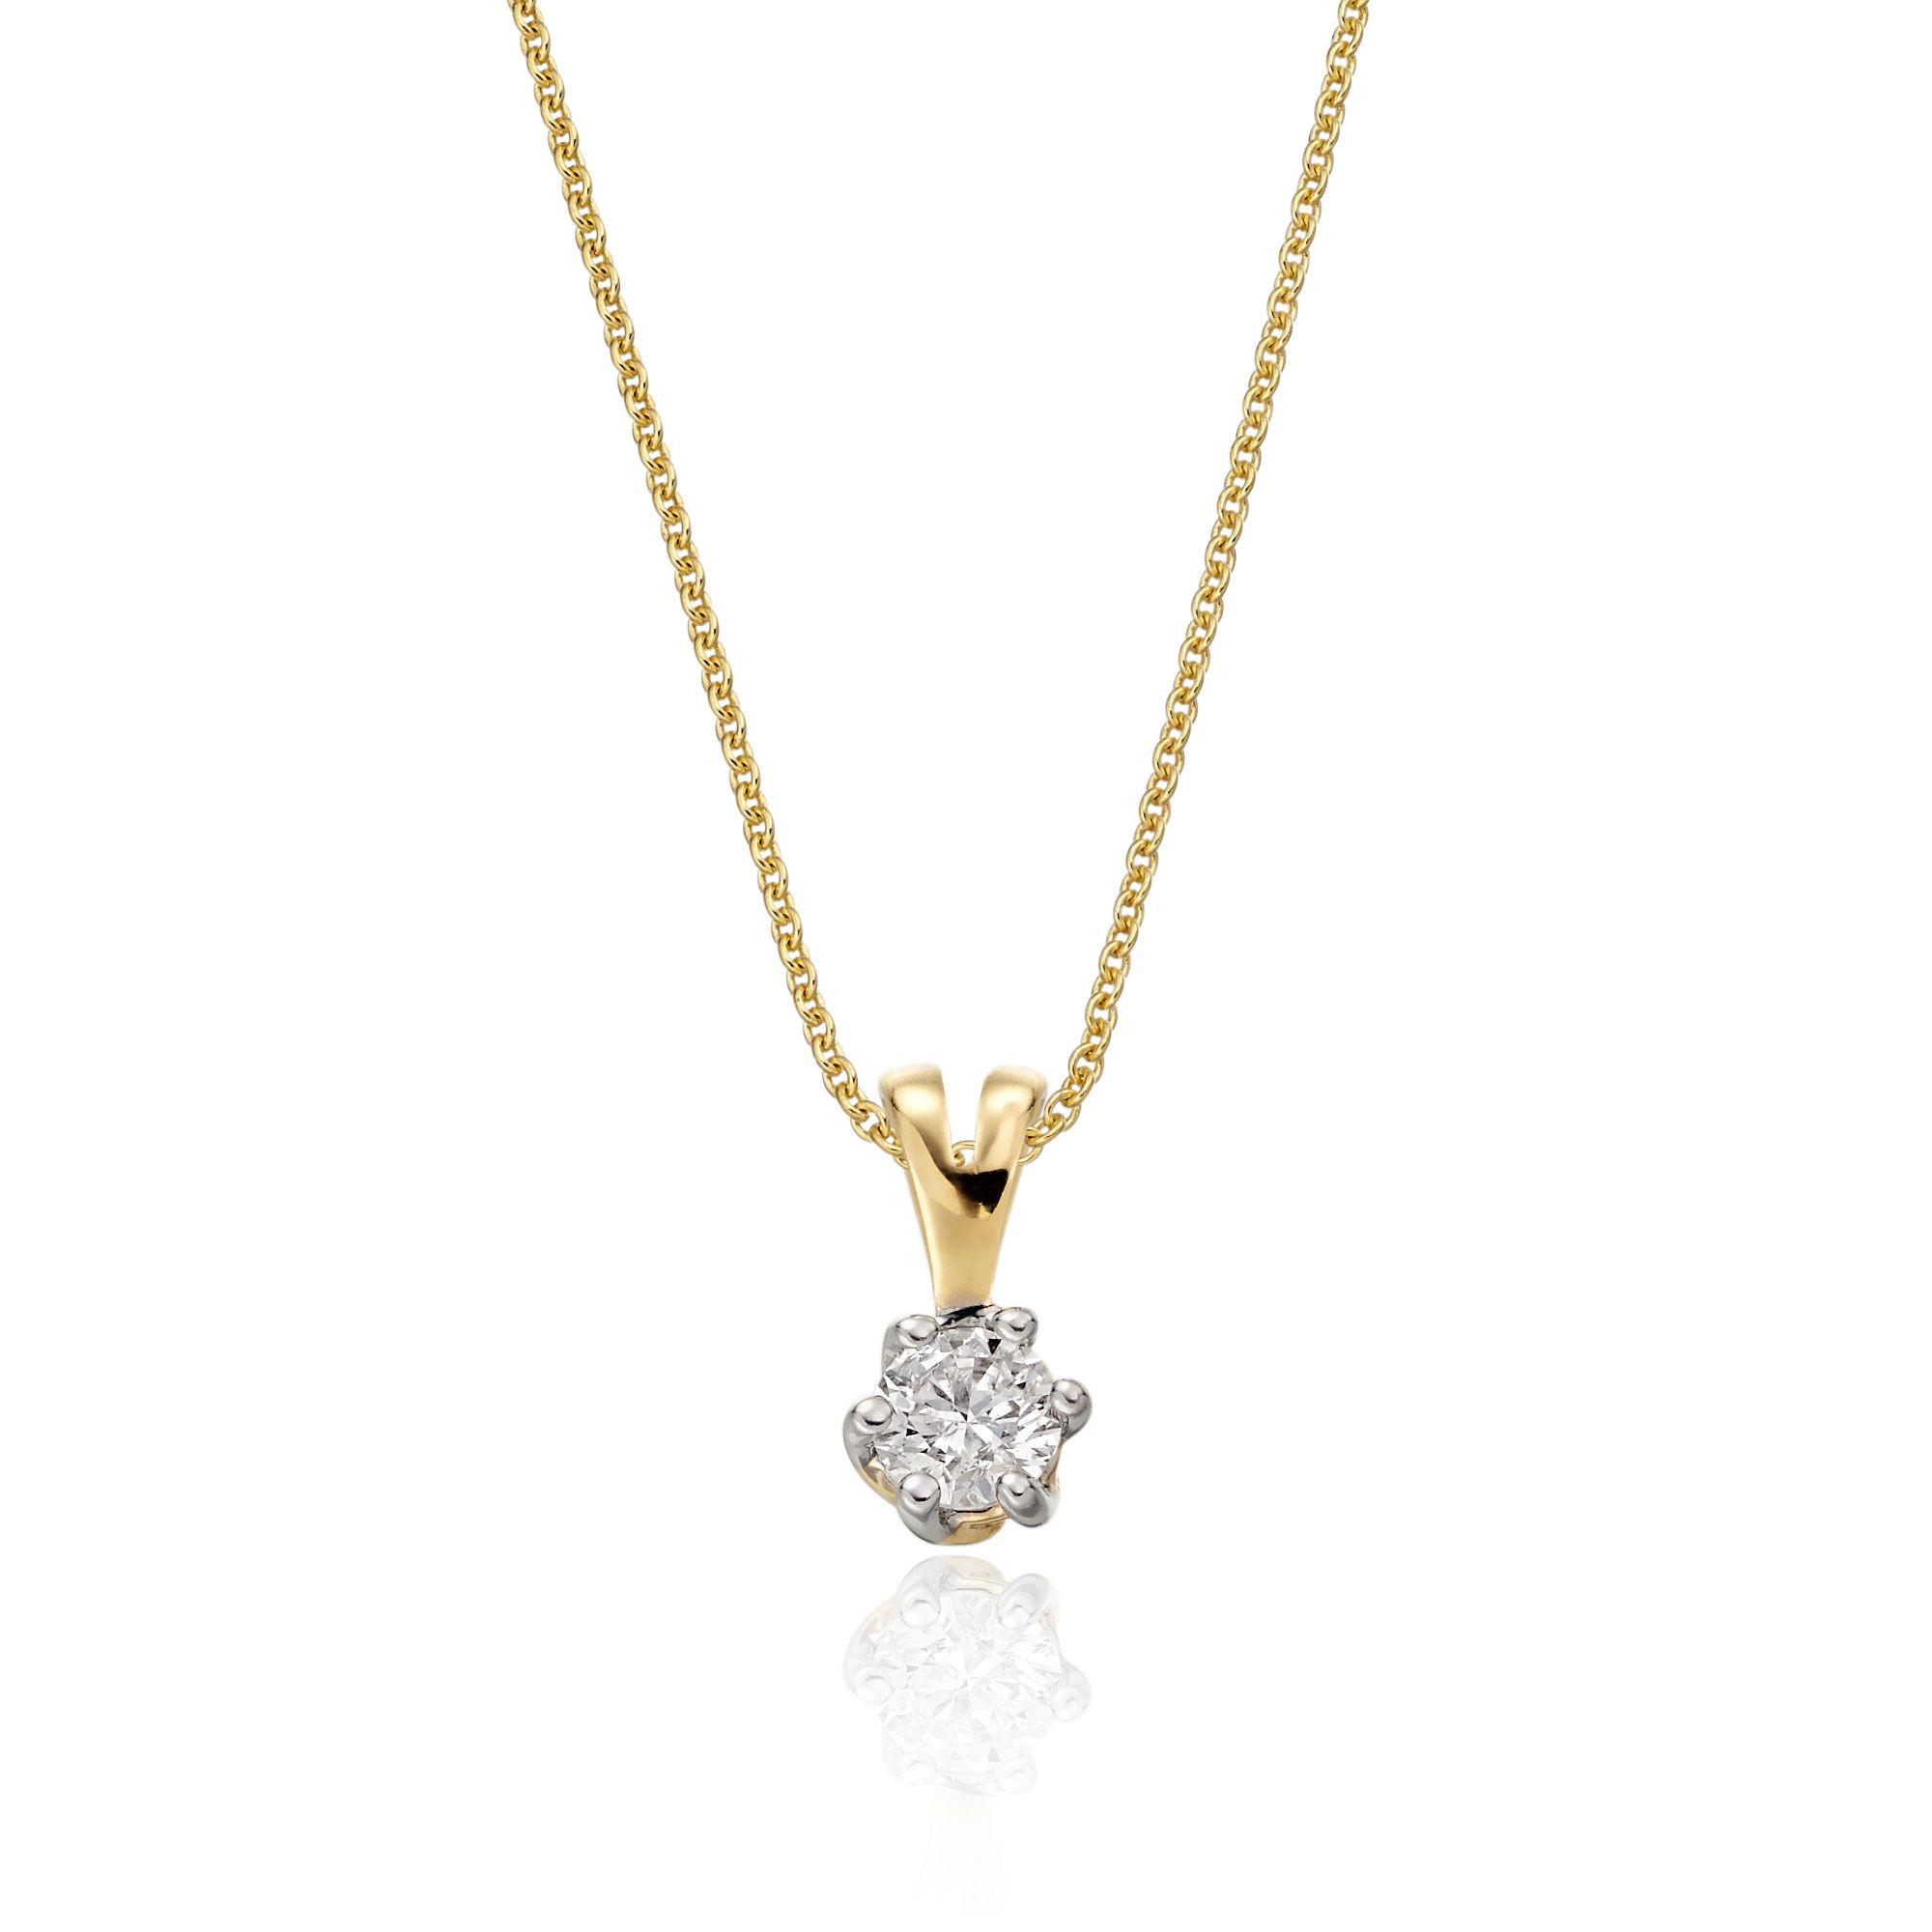 This stunning solitaire diamond pendant has a ct brilliant round